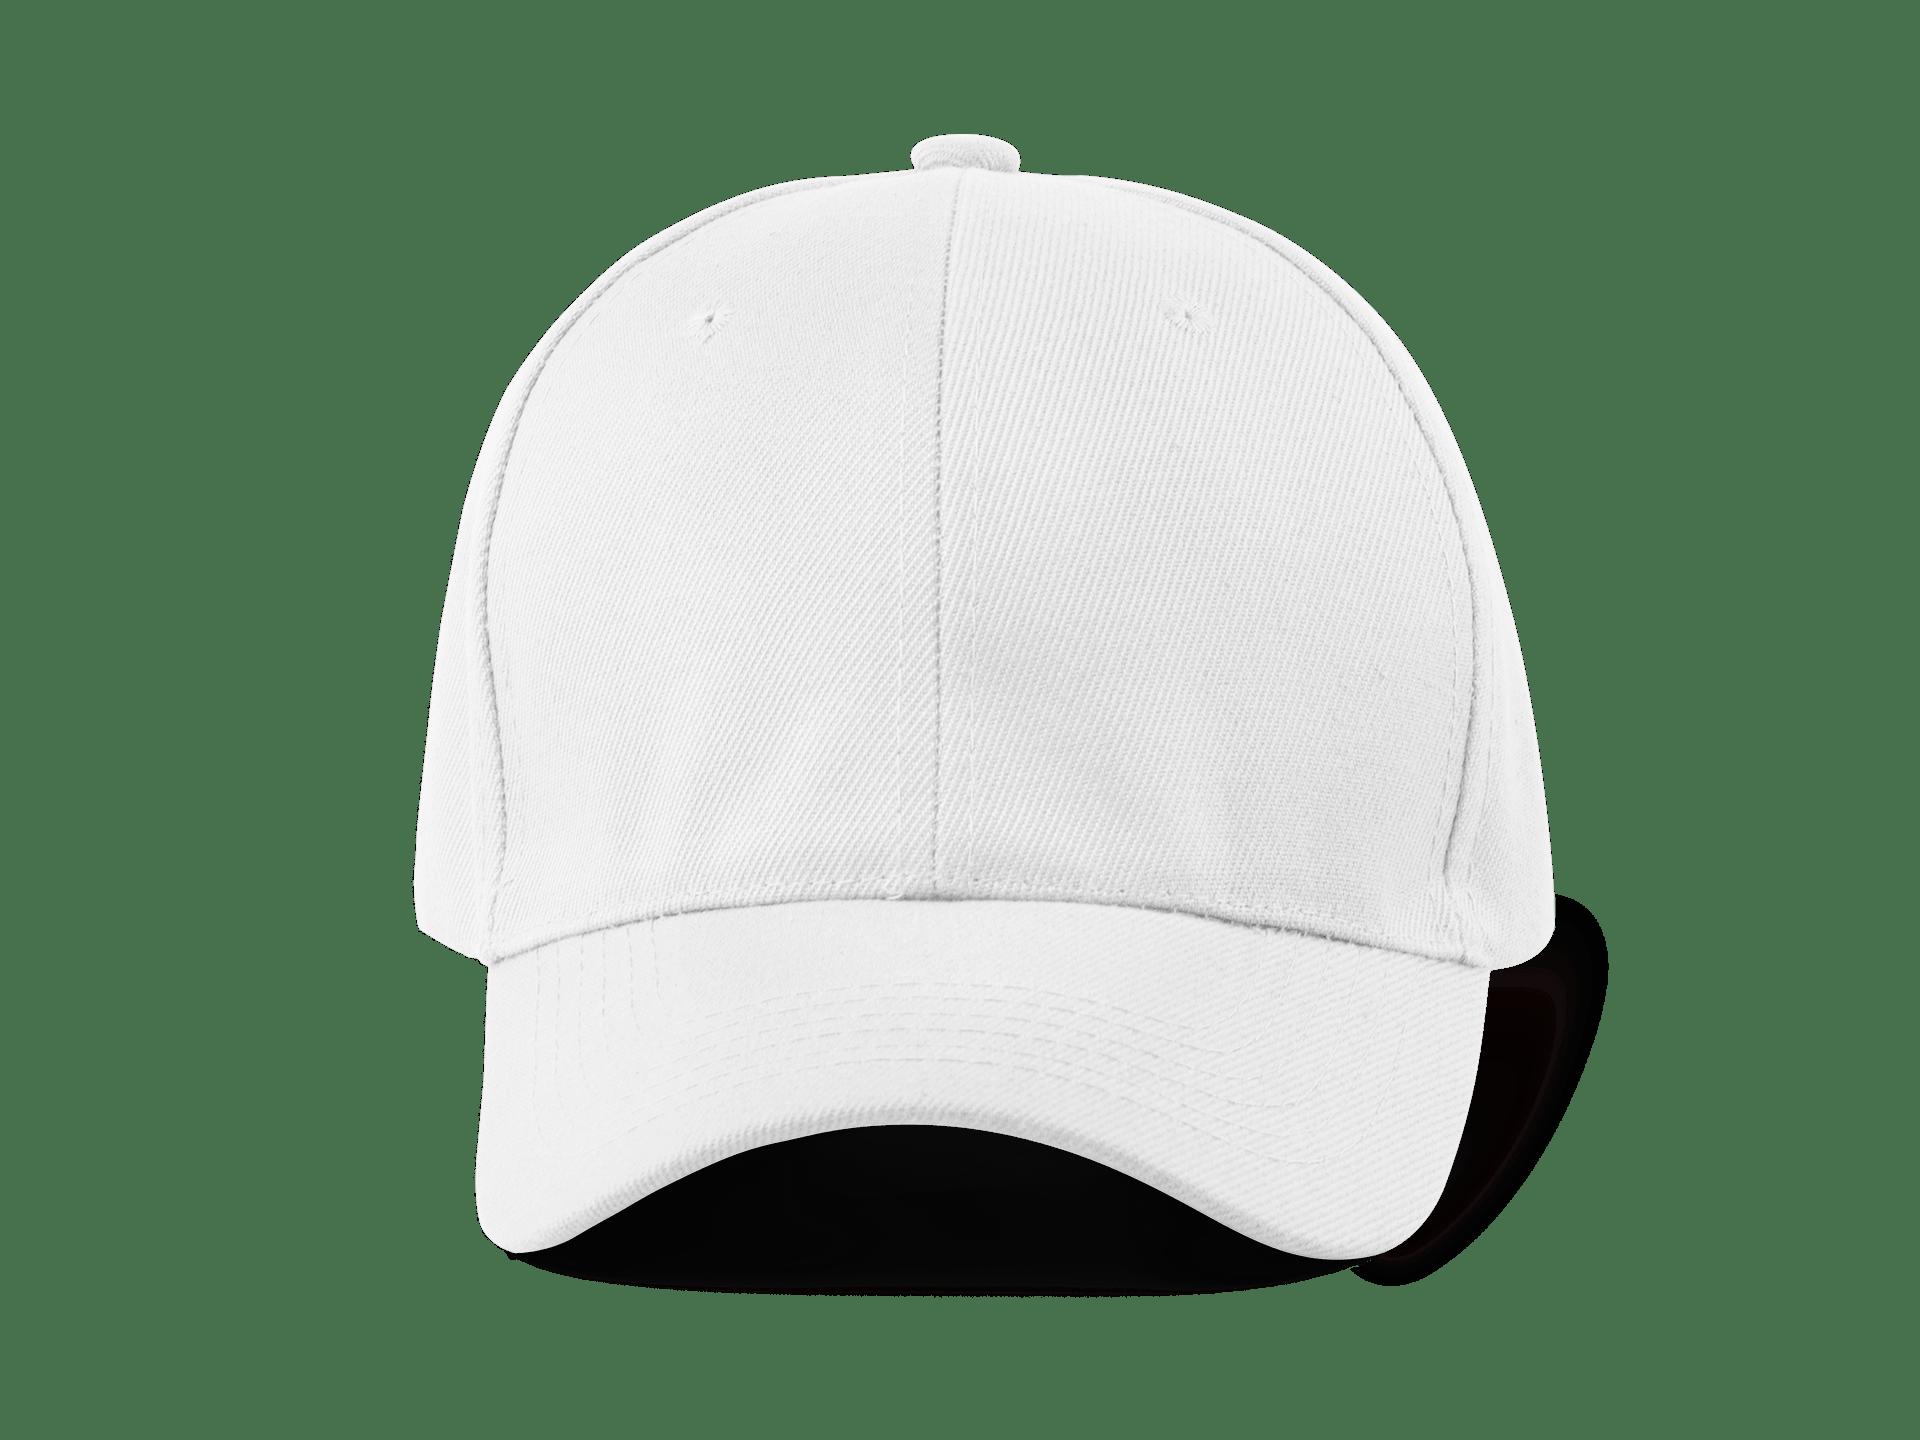 cap-white-color